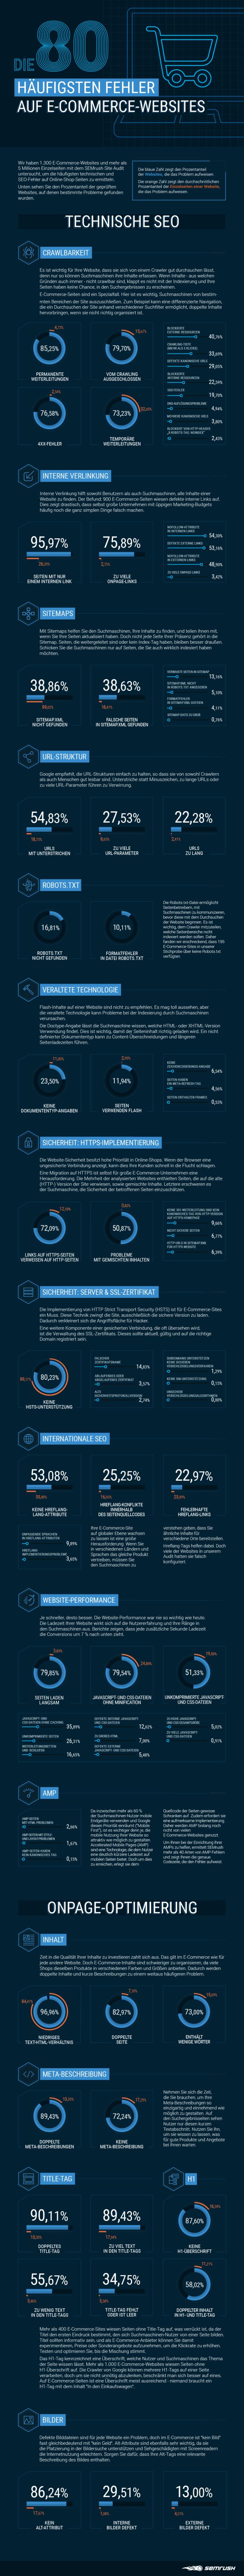 infografik-die-80-haeufigten-fehler-auf-e-commerce-websites-by-semrush.png